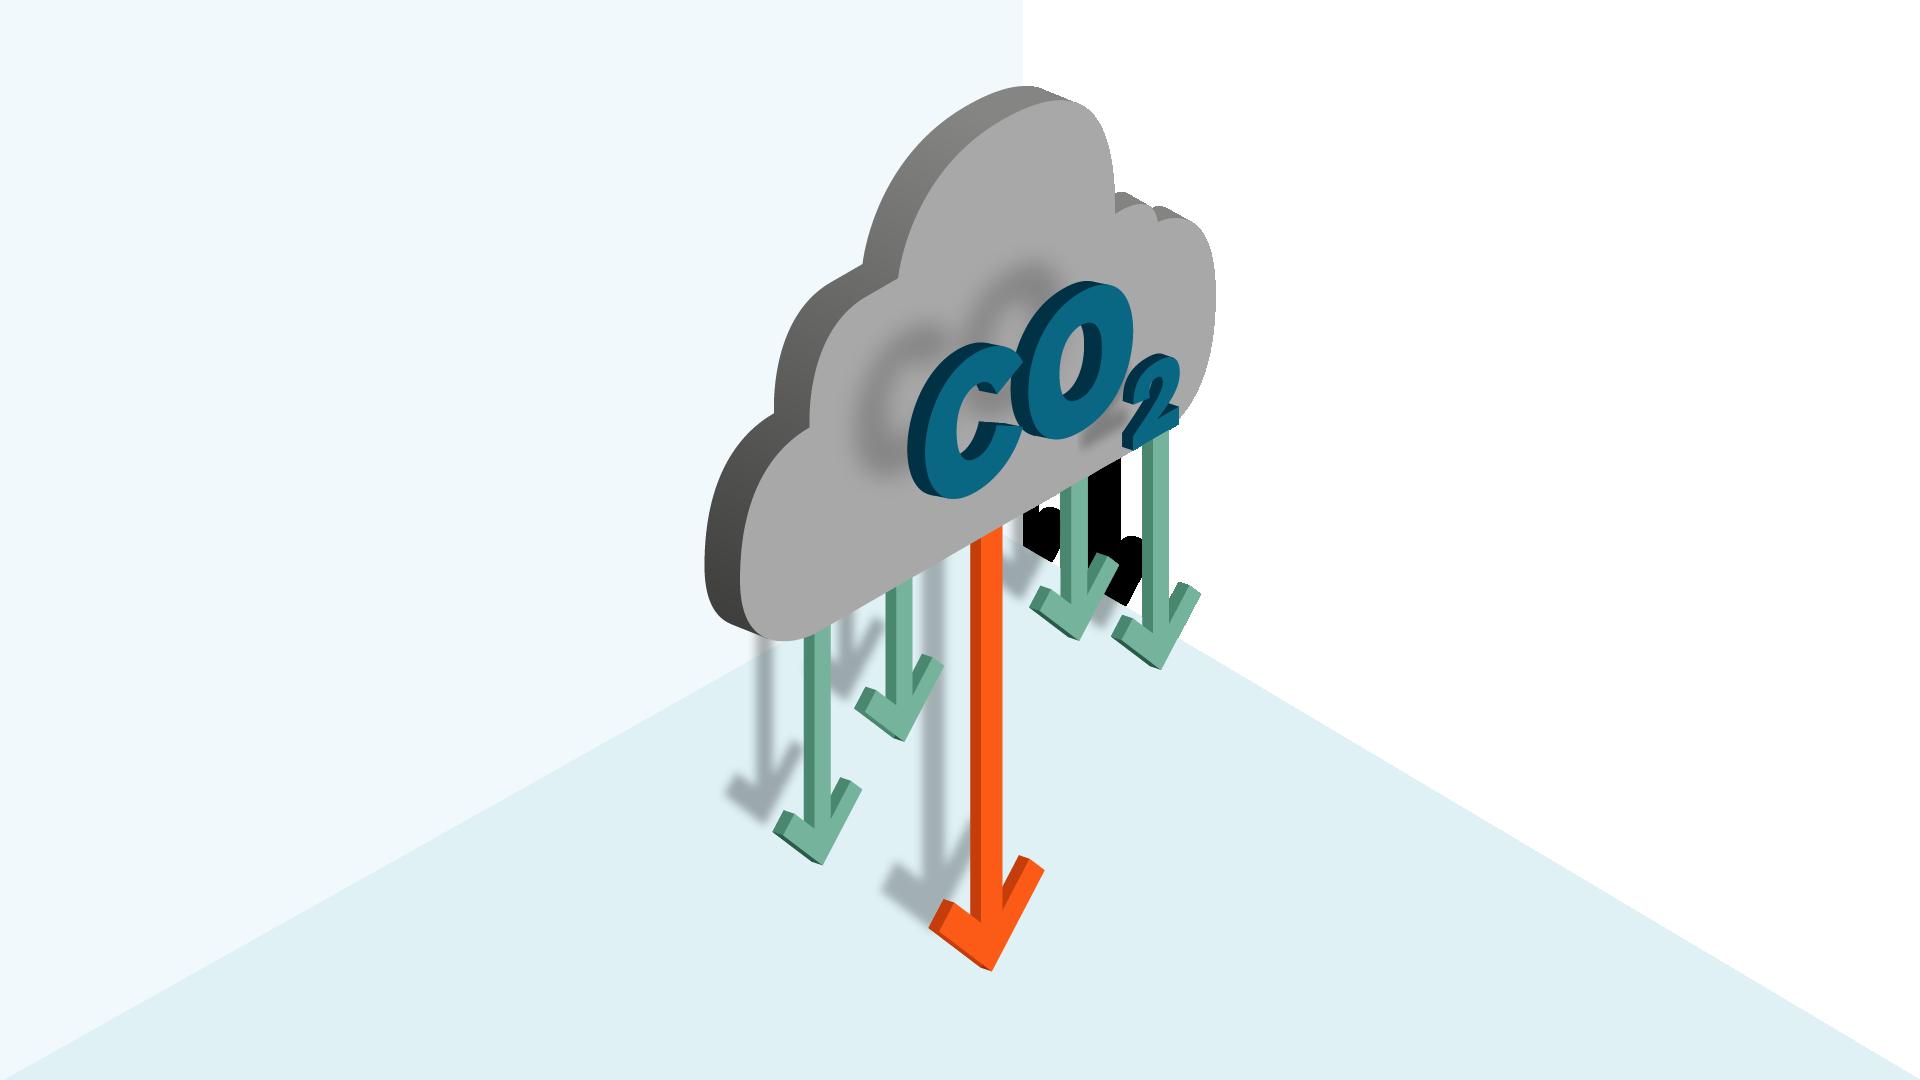 Decarbonisation insights web image